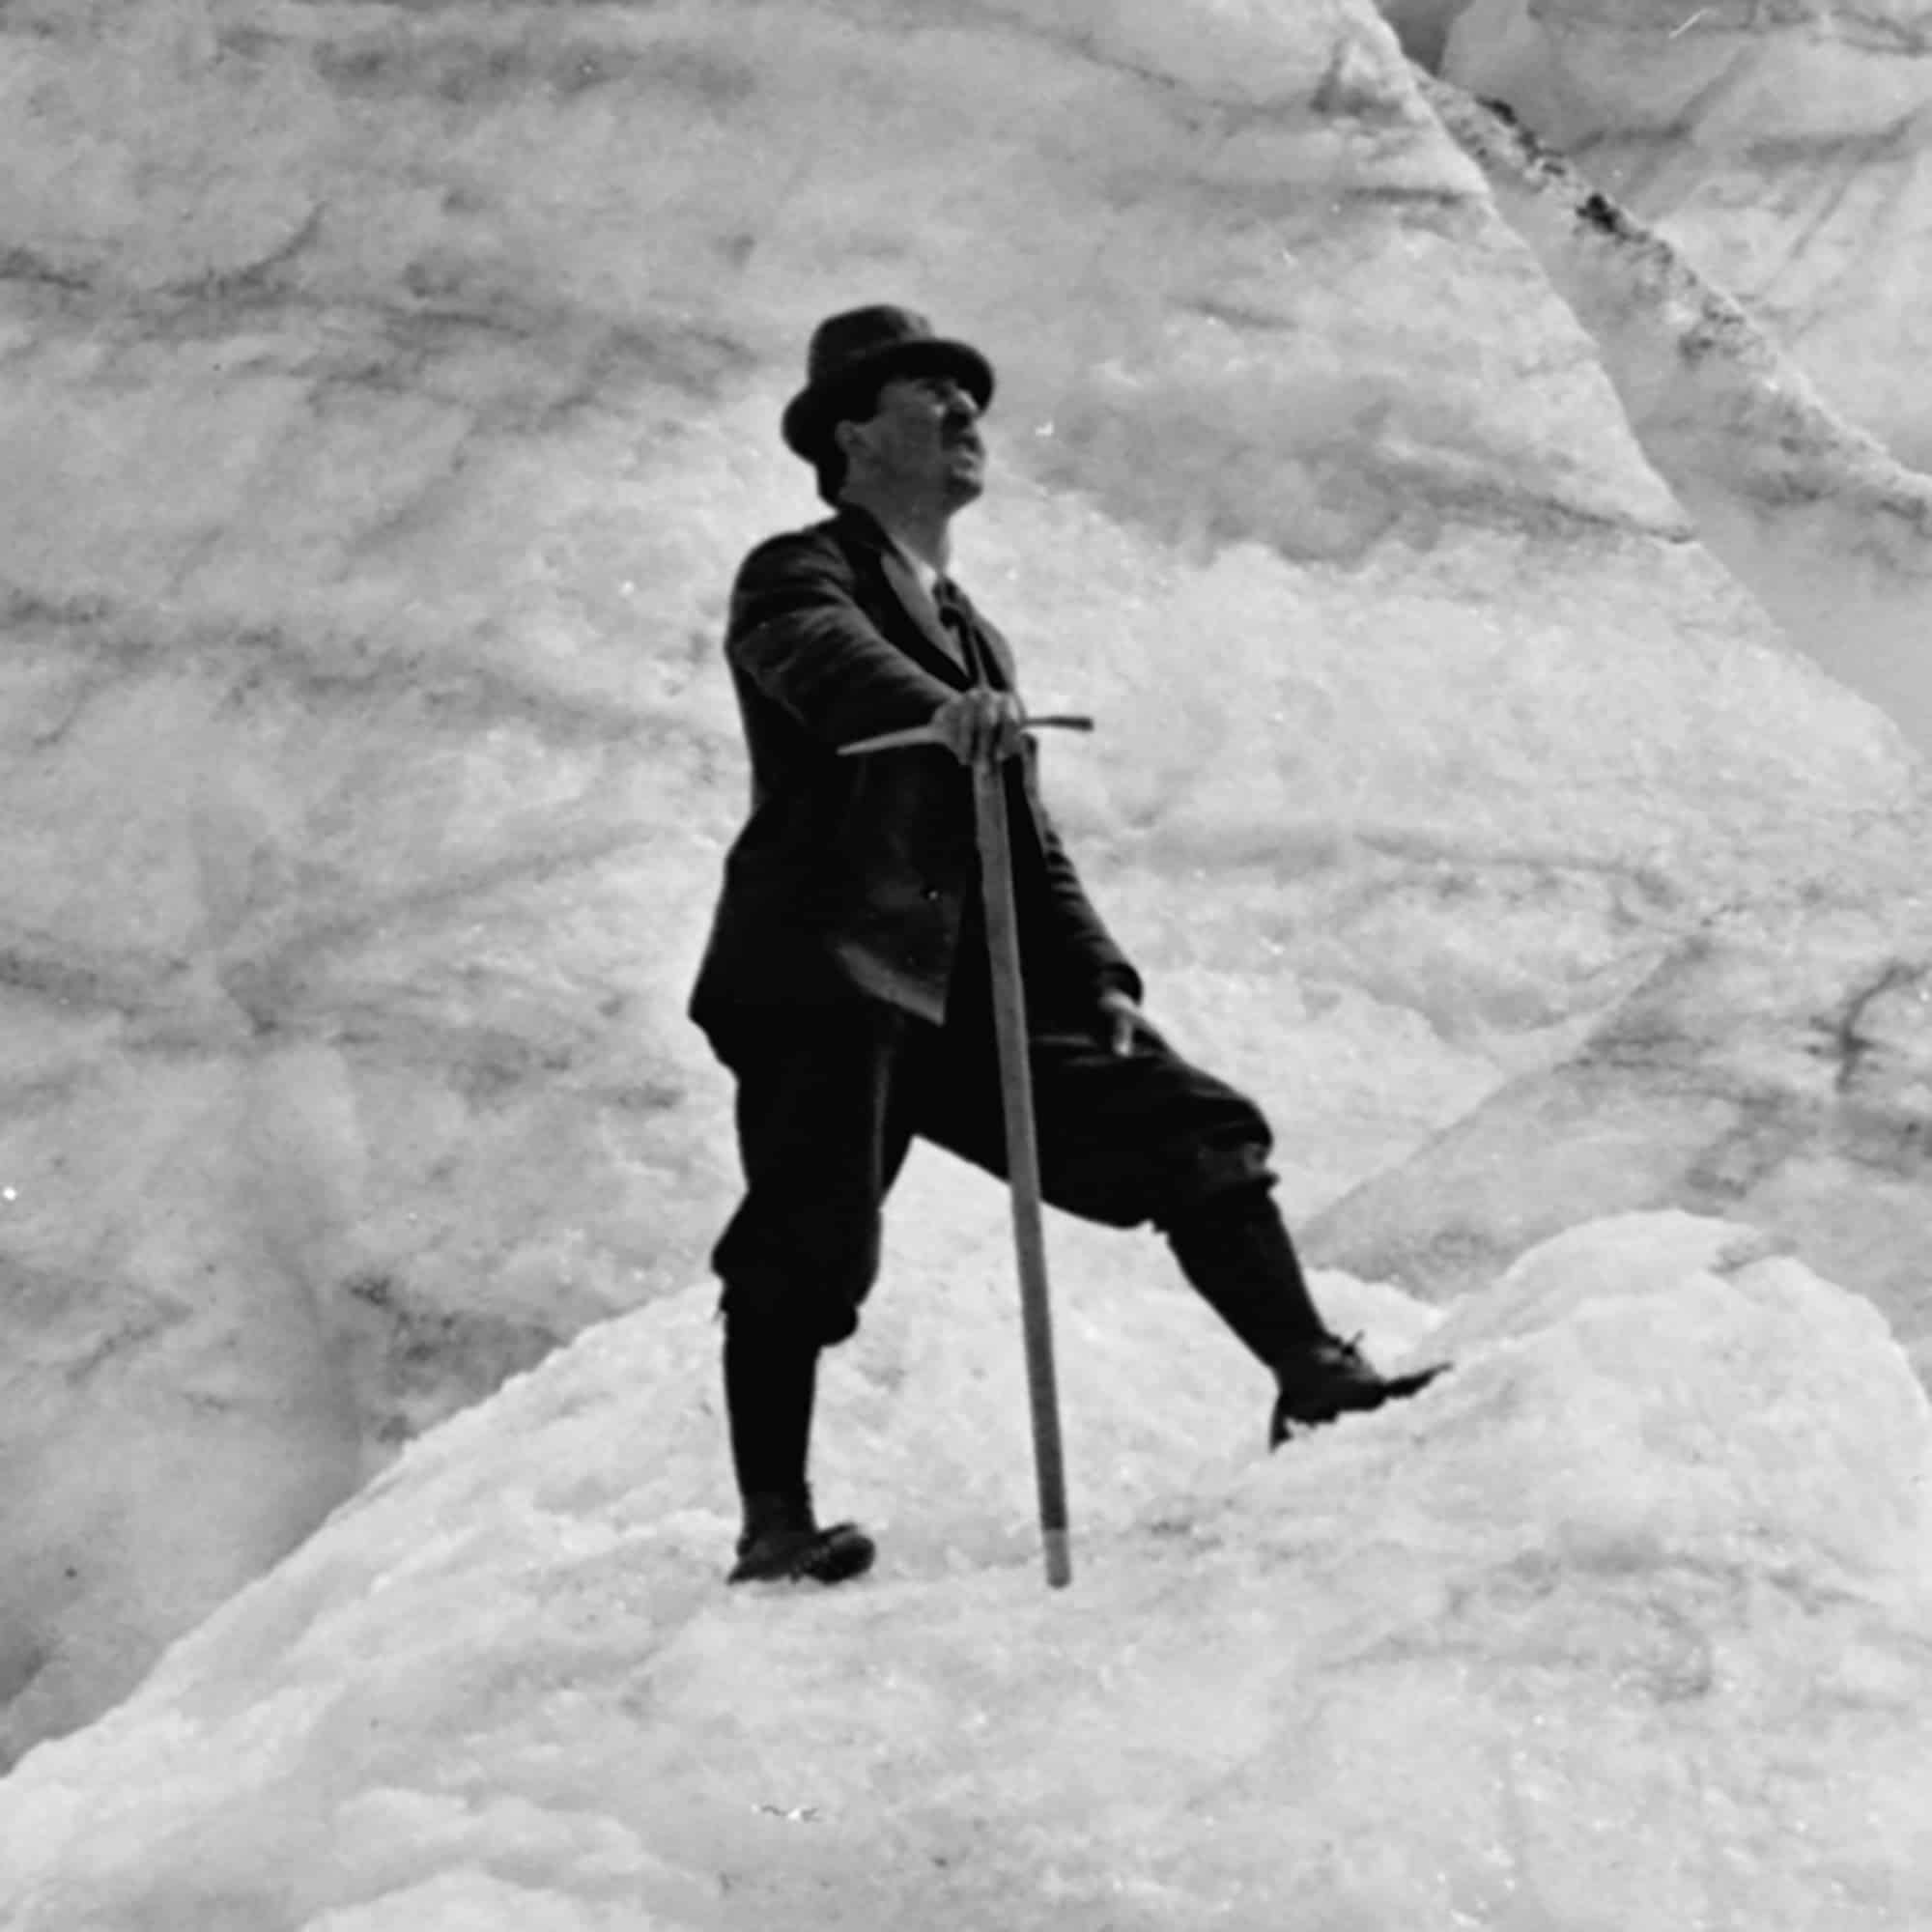 Illecillewaet Glacier from Seracs, crop